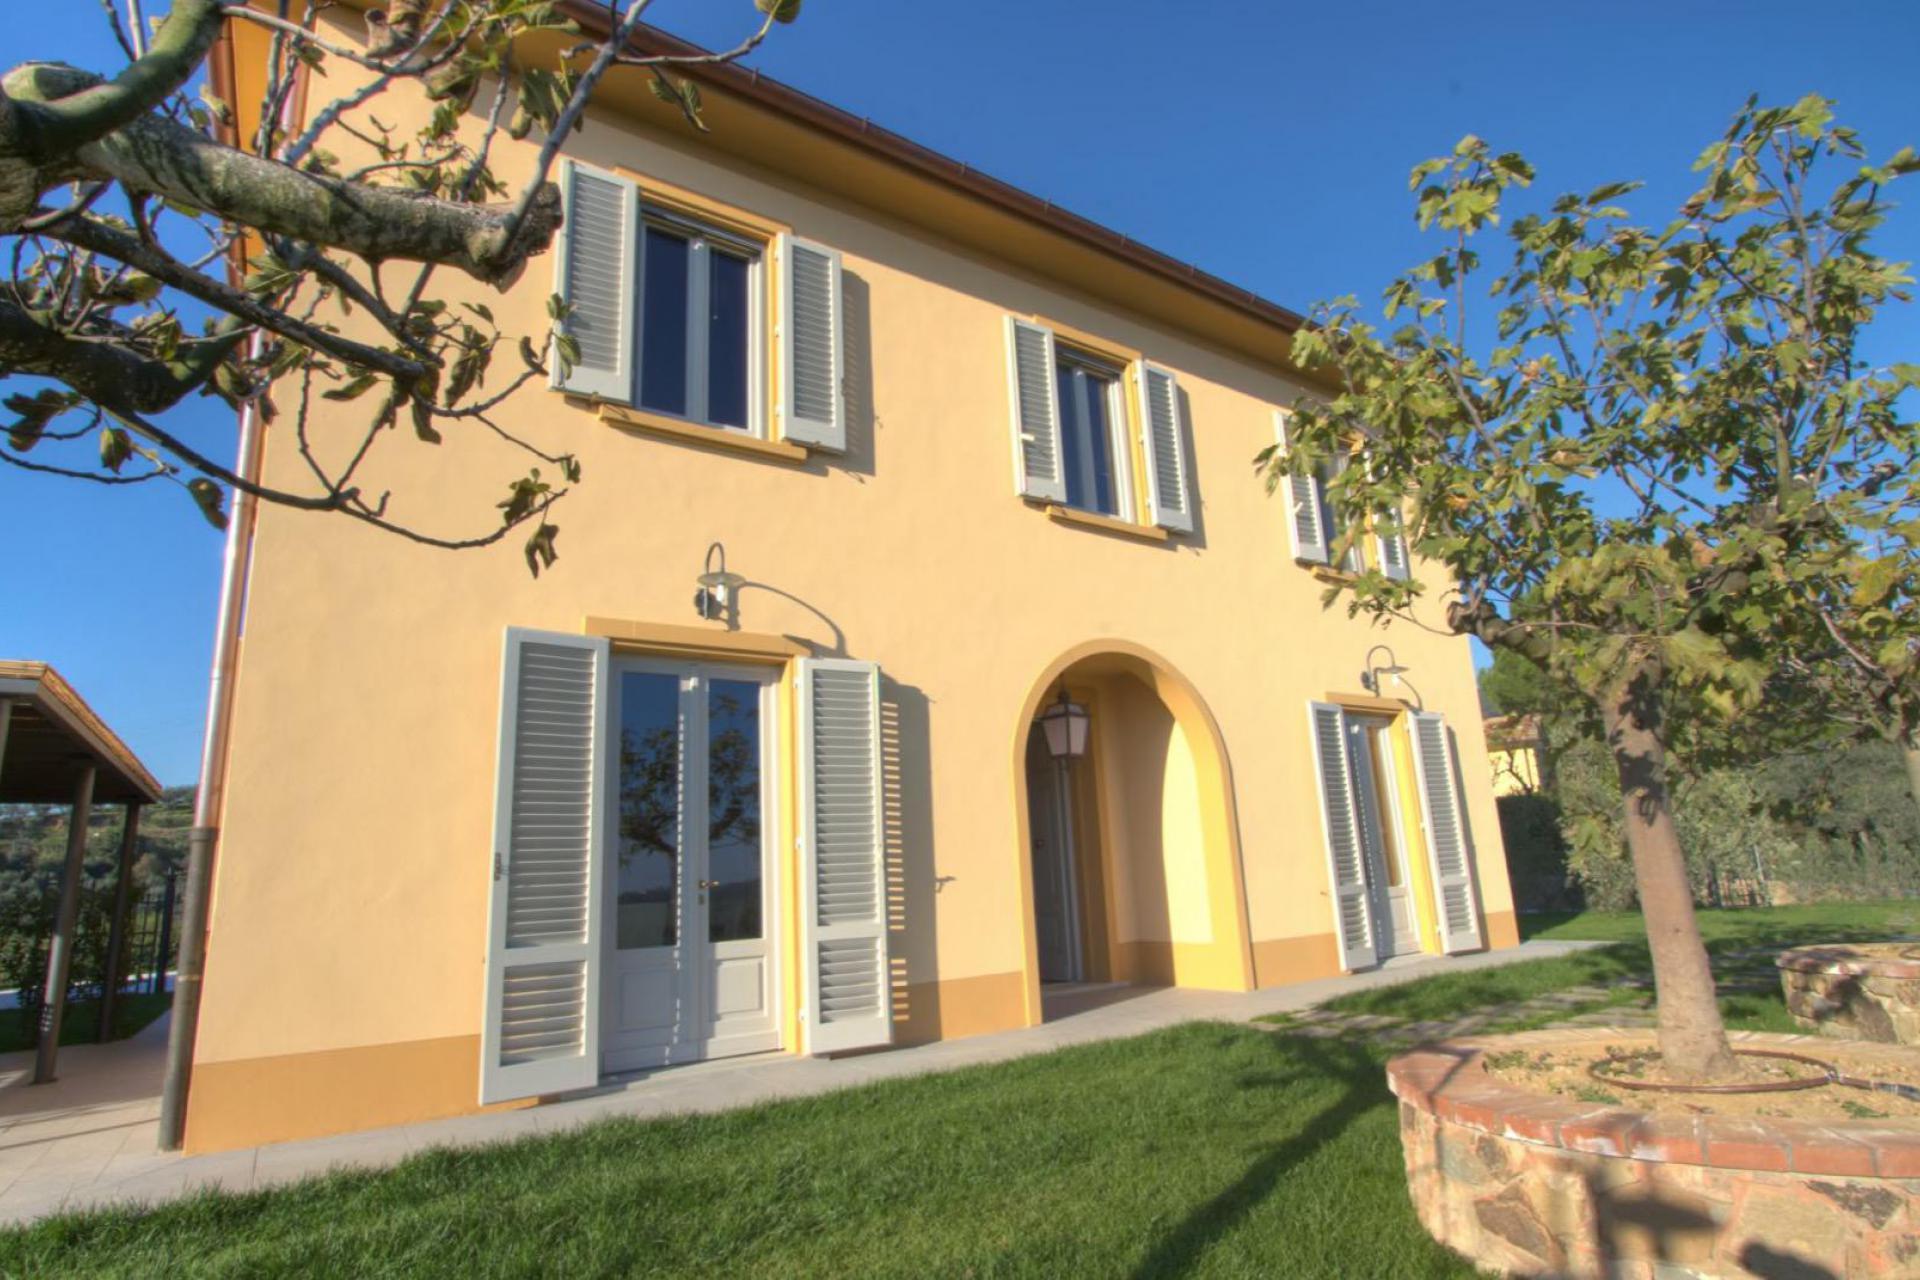 Agriturismo Toscana Agriturismo Toscana per famiglie con bambini